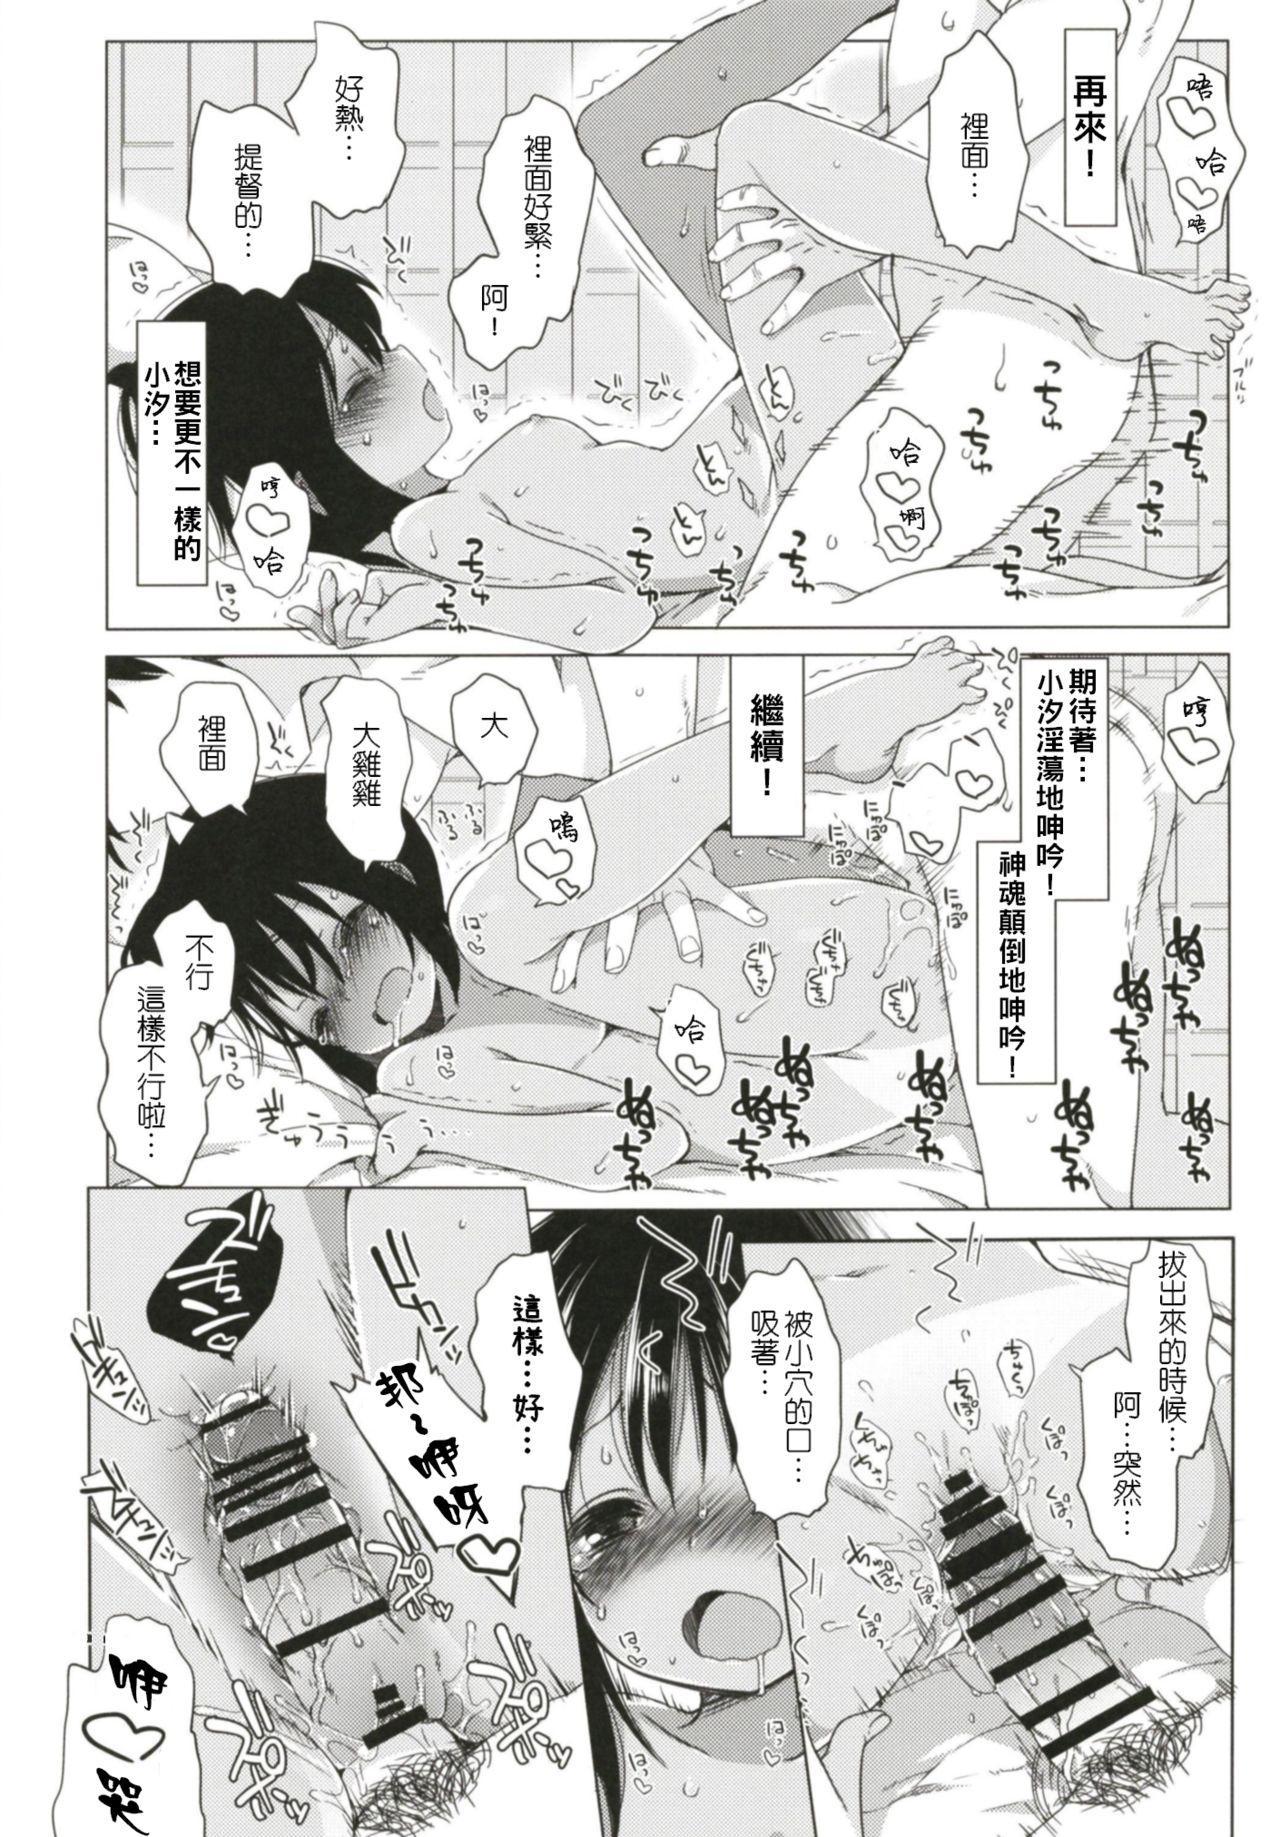 [French letter (Fujisaki Hikari)] Hitonatsu no Ayamachi -I-401 Soushuuhen- (Kantai Collection -KanColle-) [Chinese] [Digital] 17